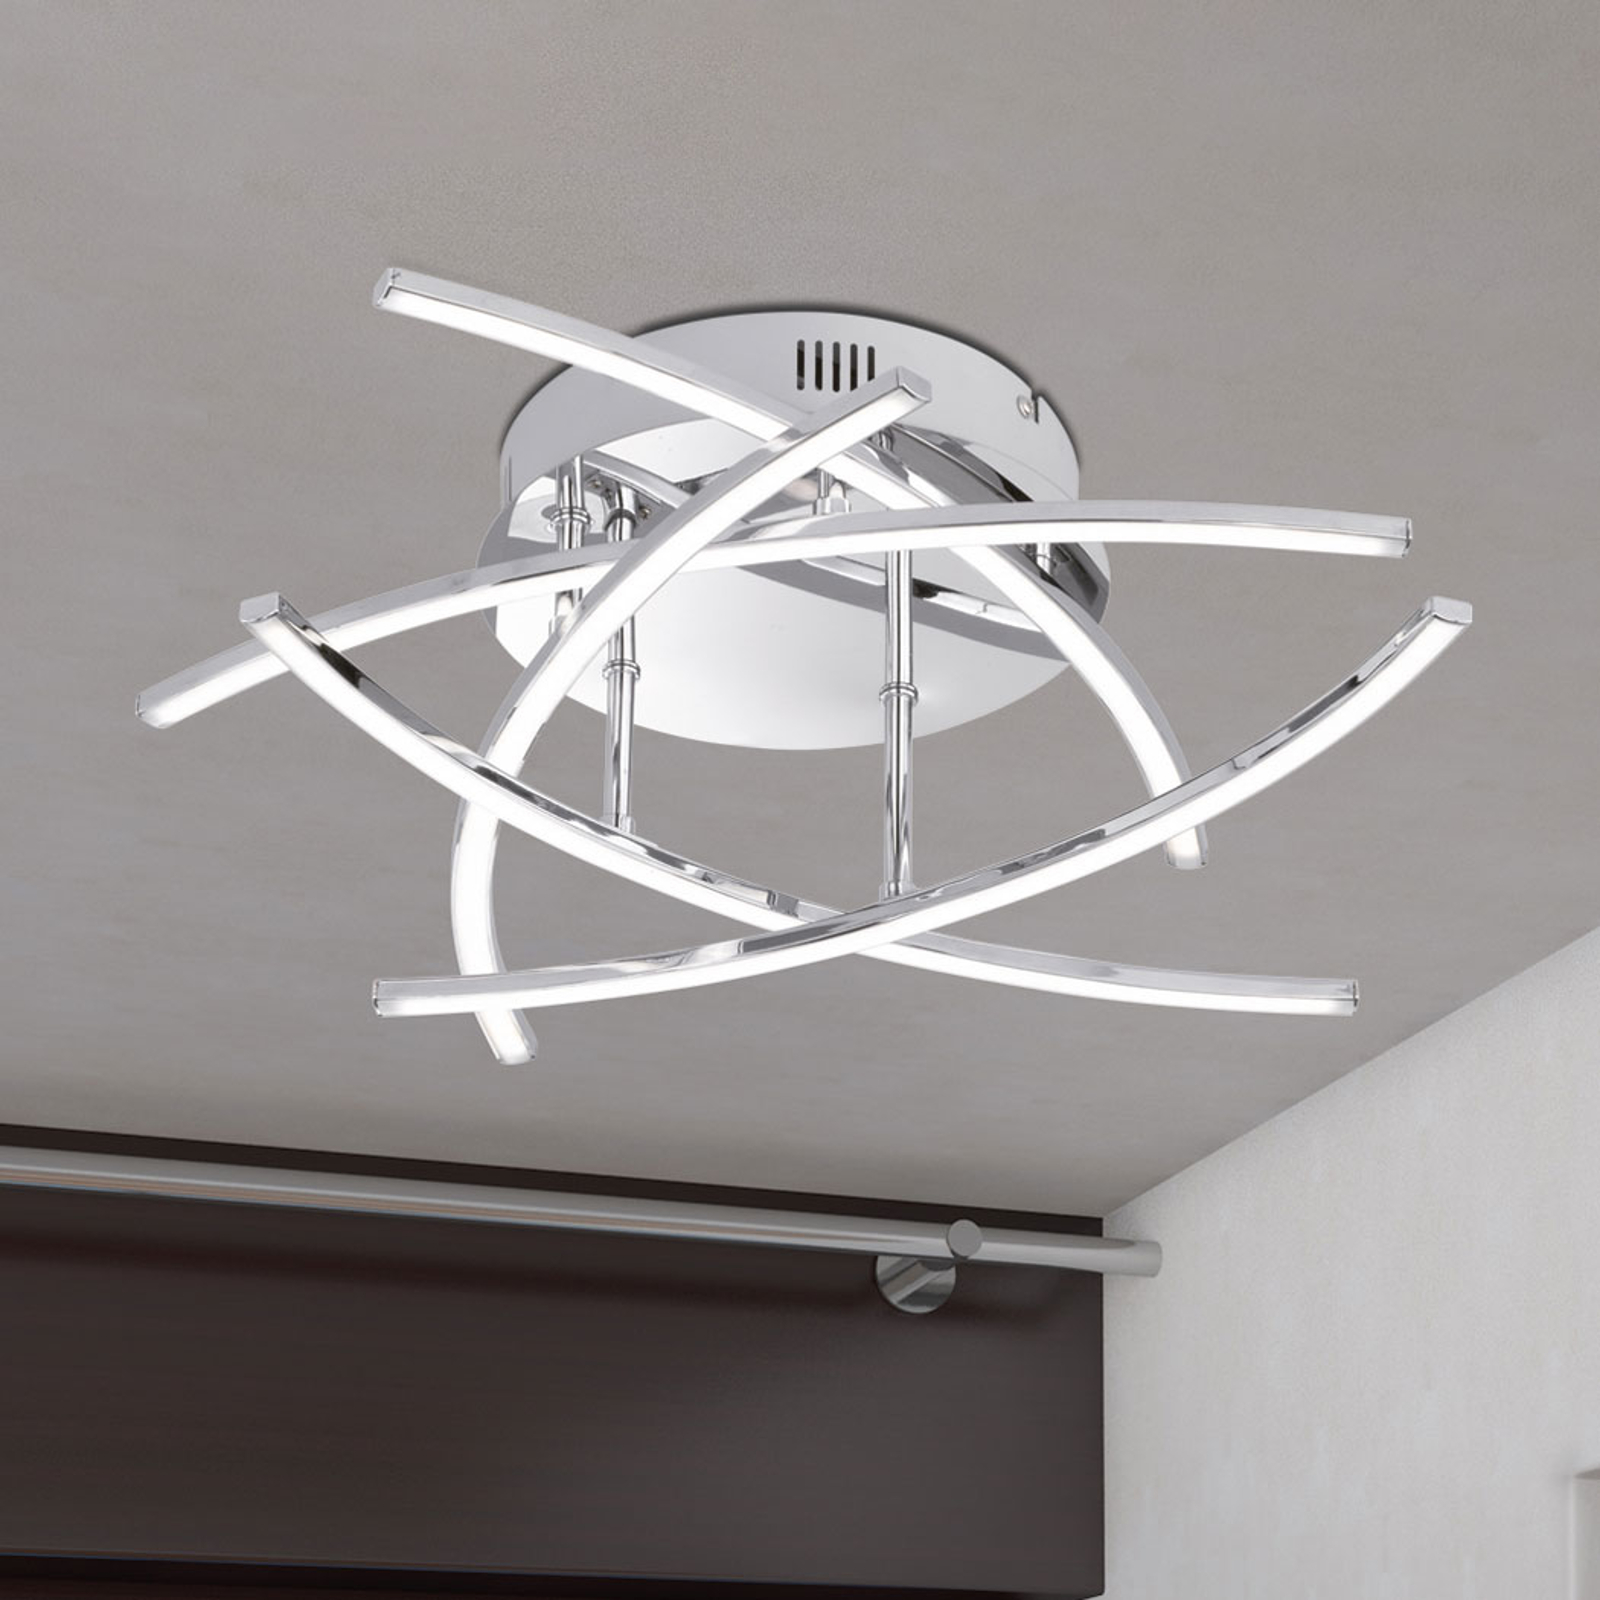 LED-Deckenlampe Cross 5-flammig, chrom